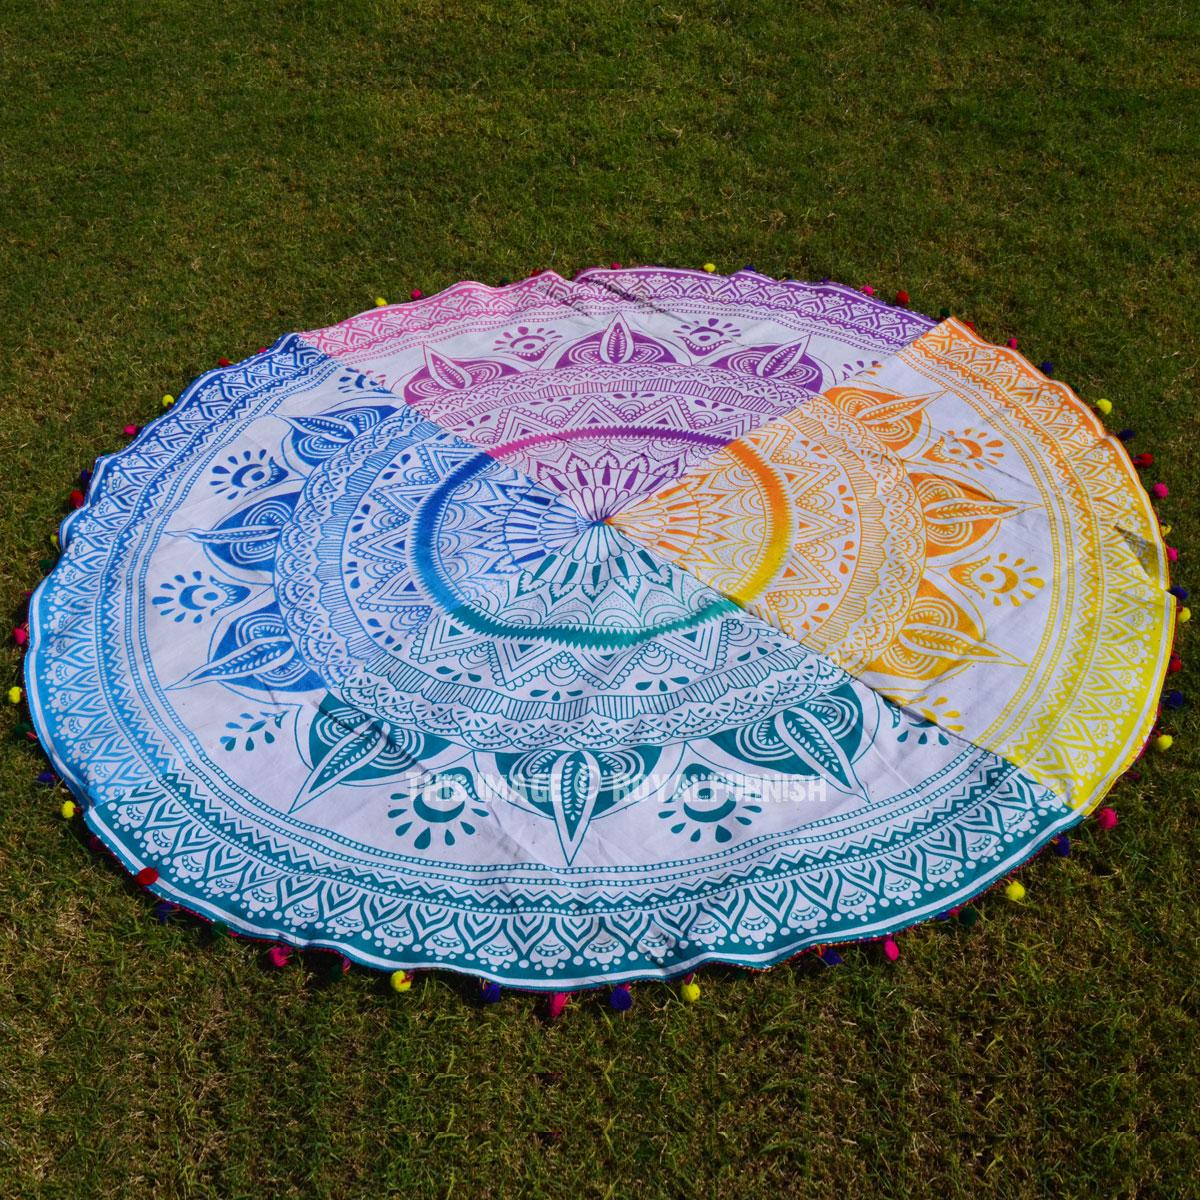 Colorful Pom Pom Ombre Round Mandala Beach Towel